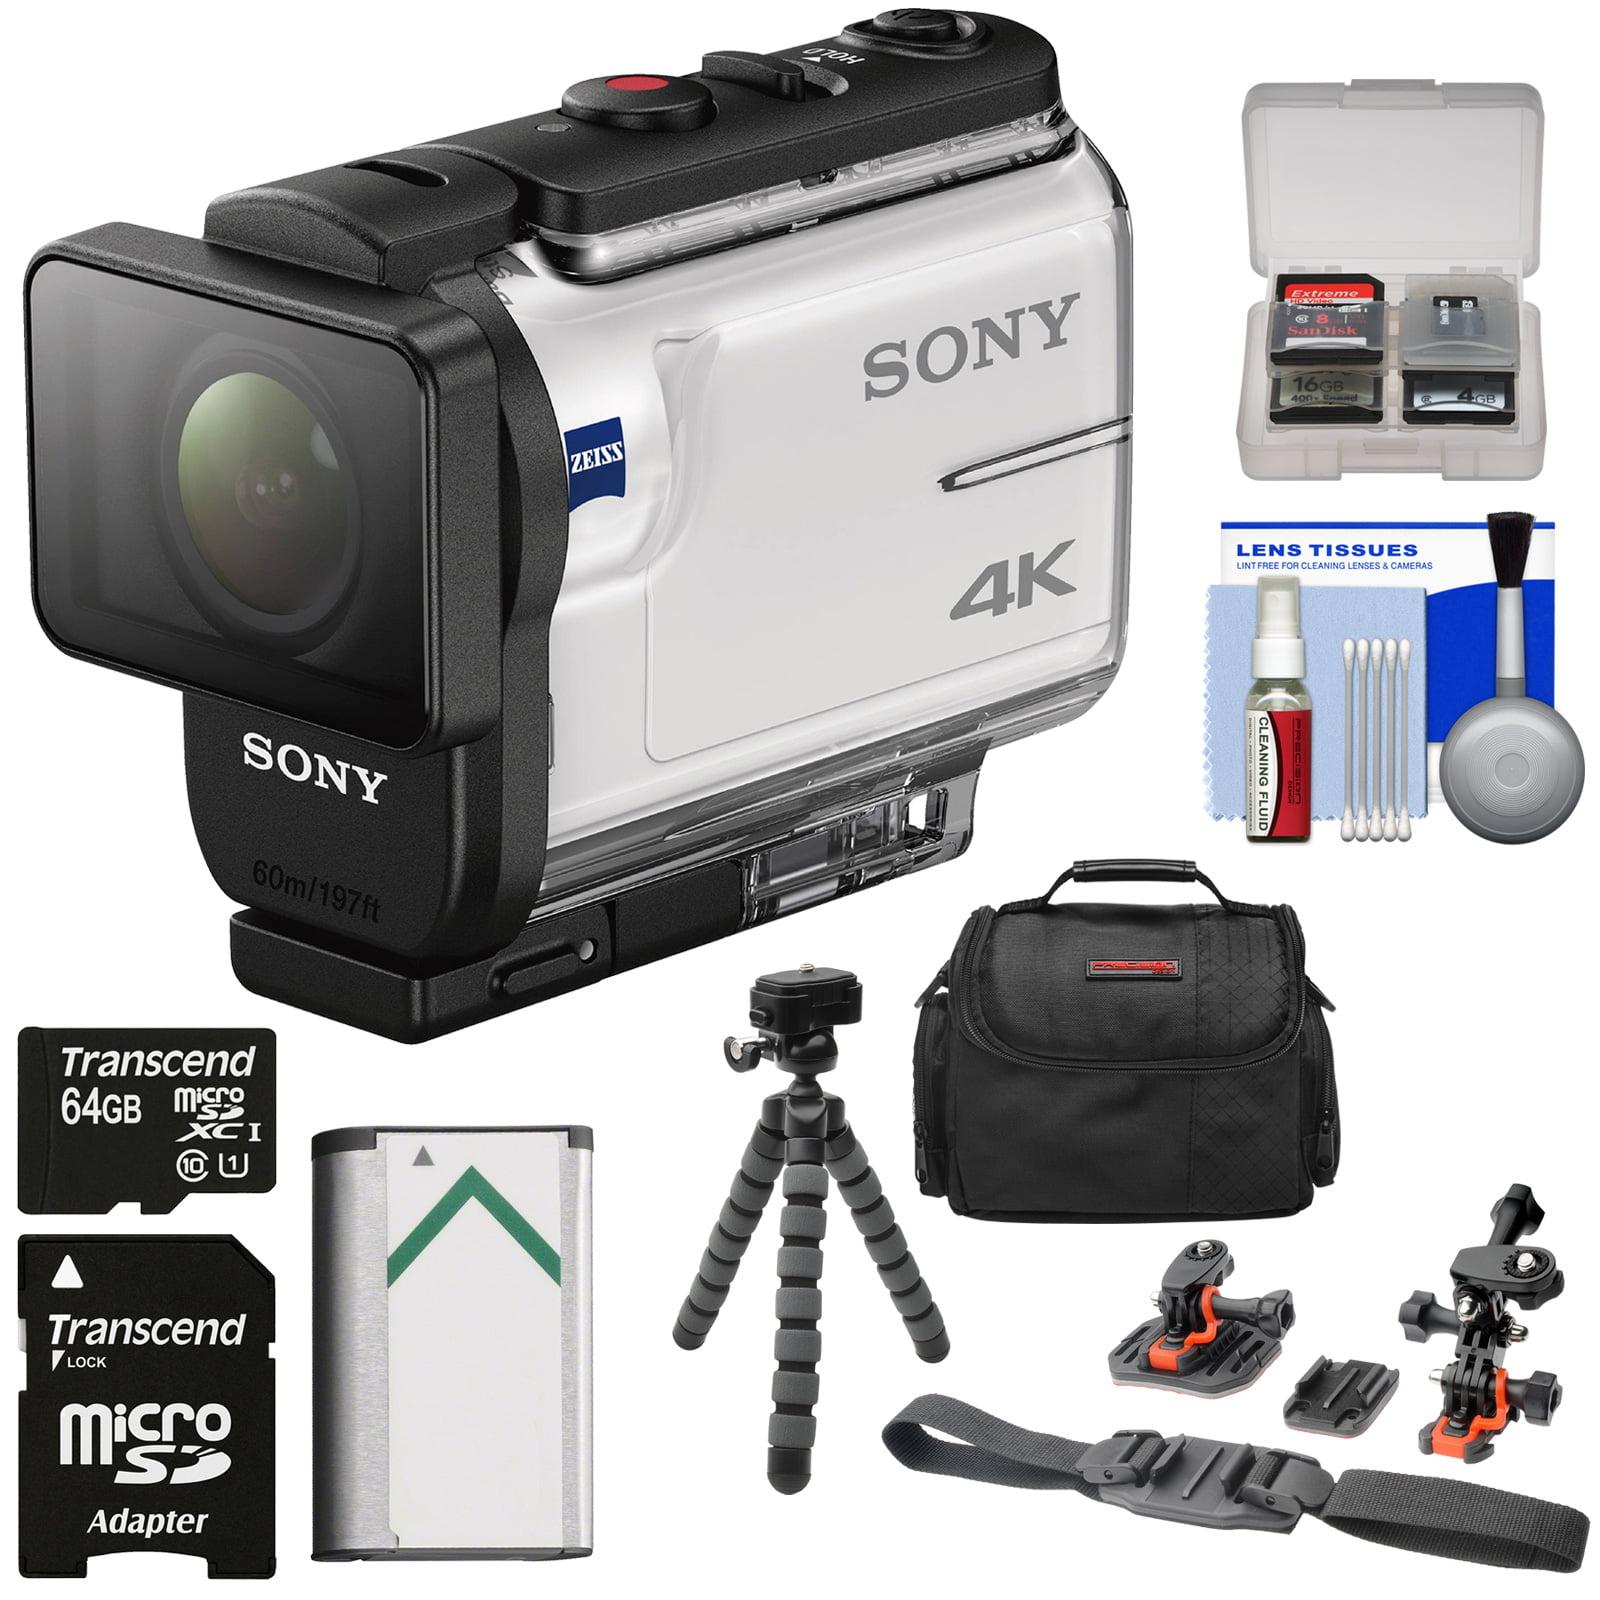 Sony Action Cam FDR-X3000 Wi-Fi GPS 4K HD Video Camera Ca...